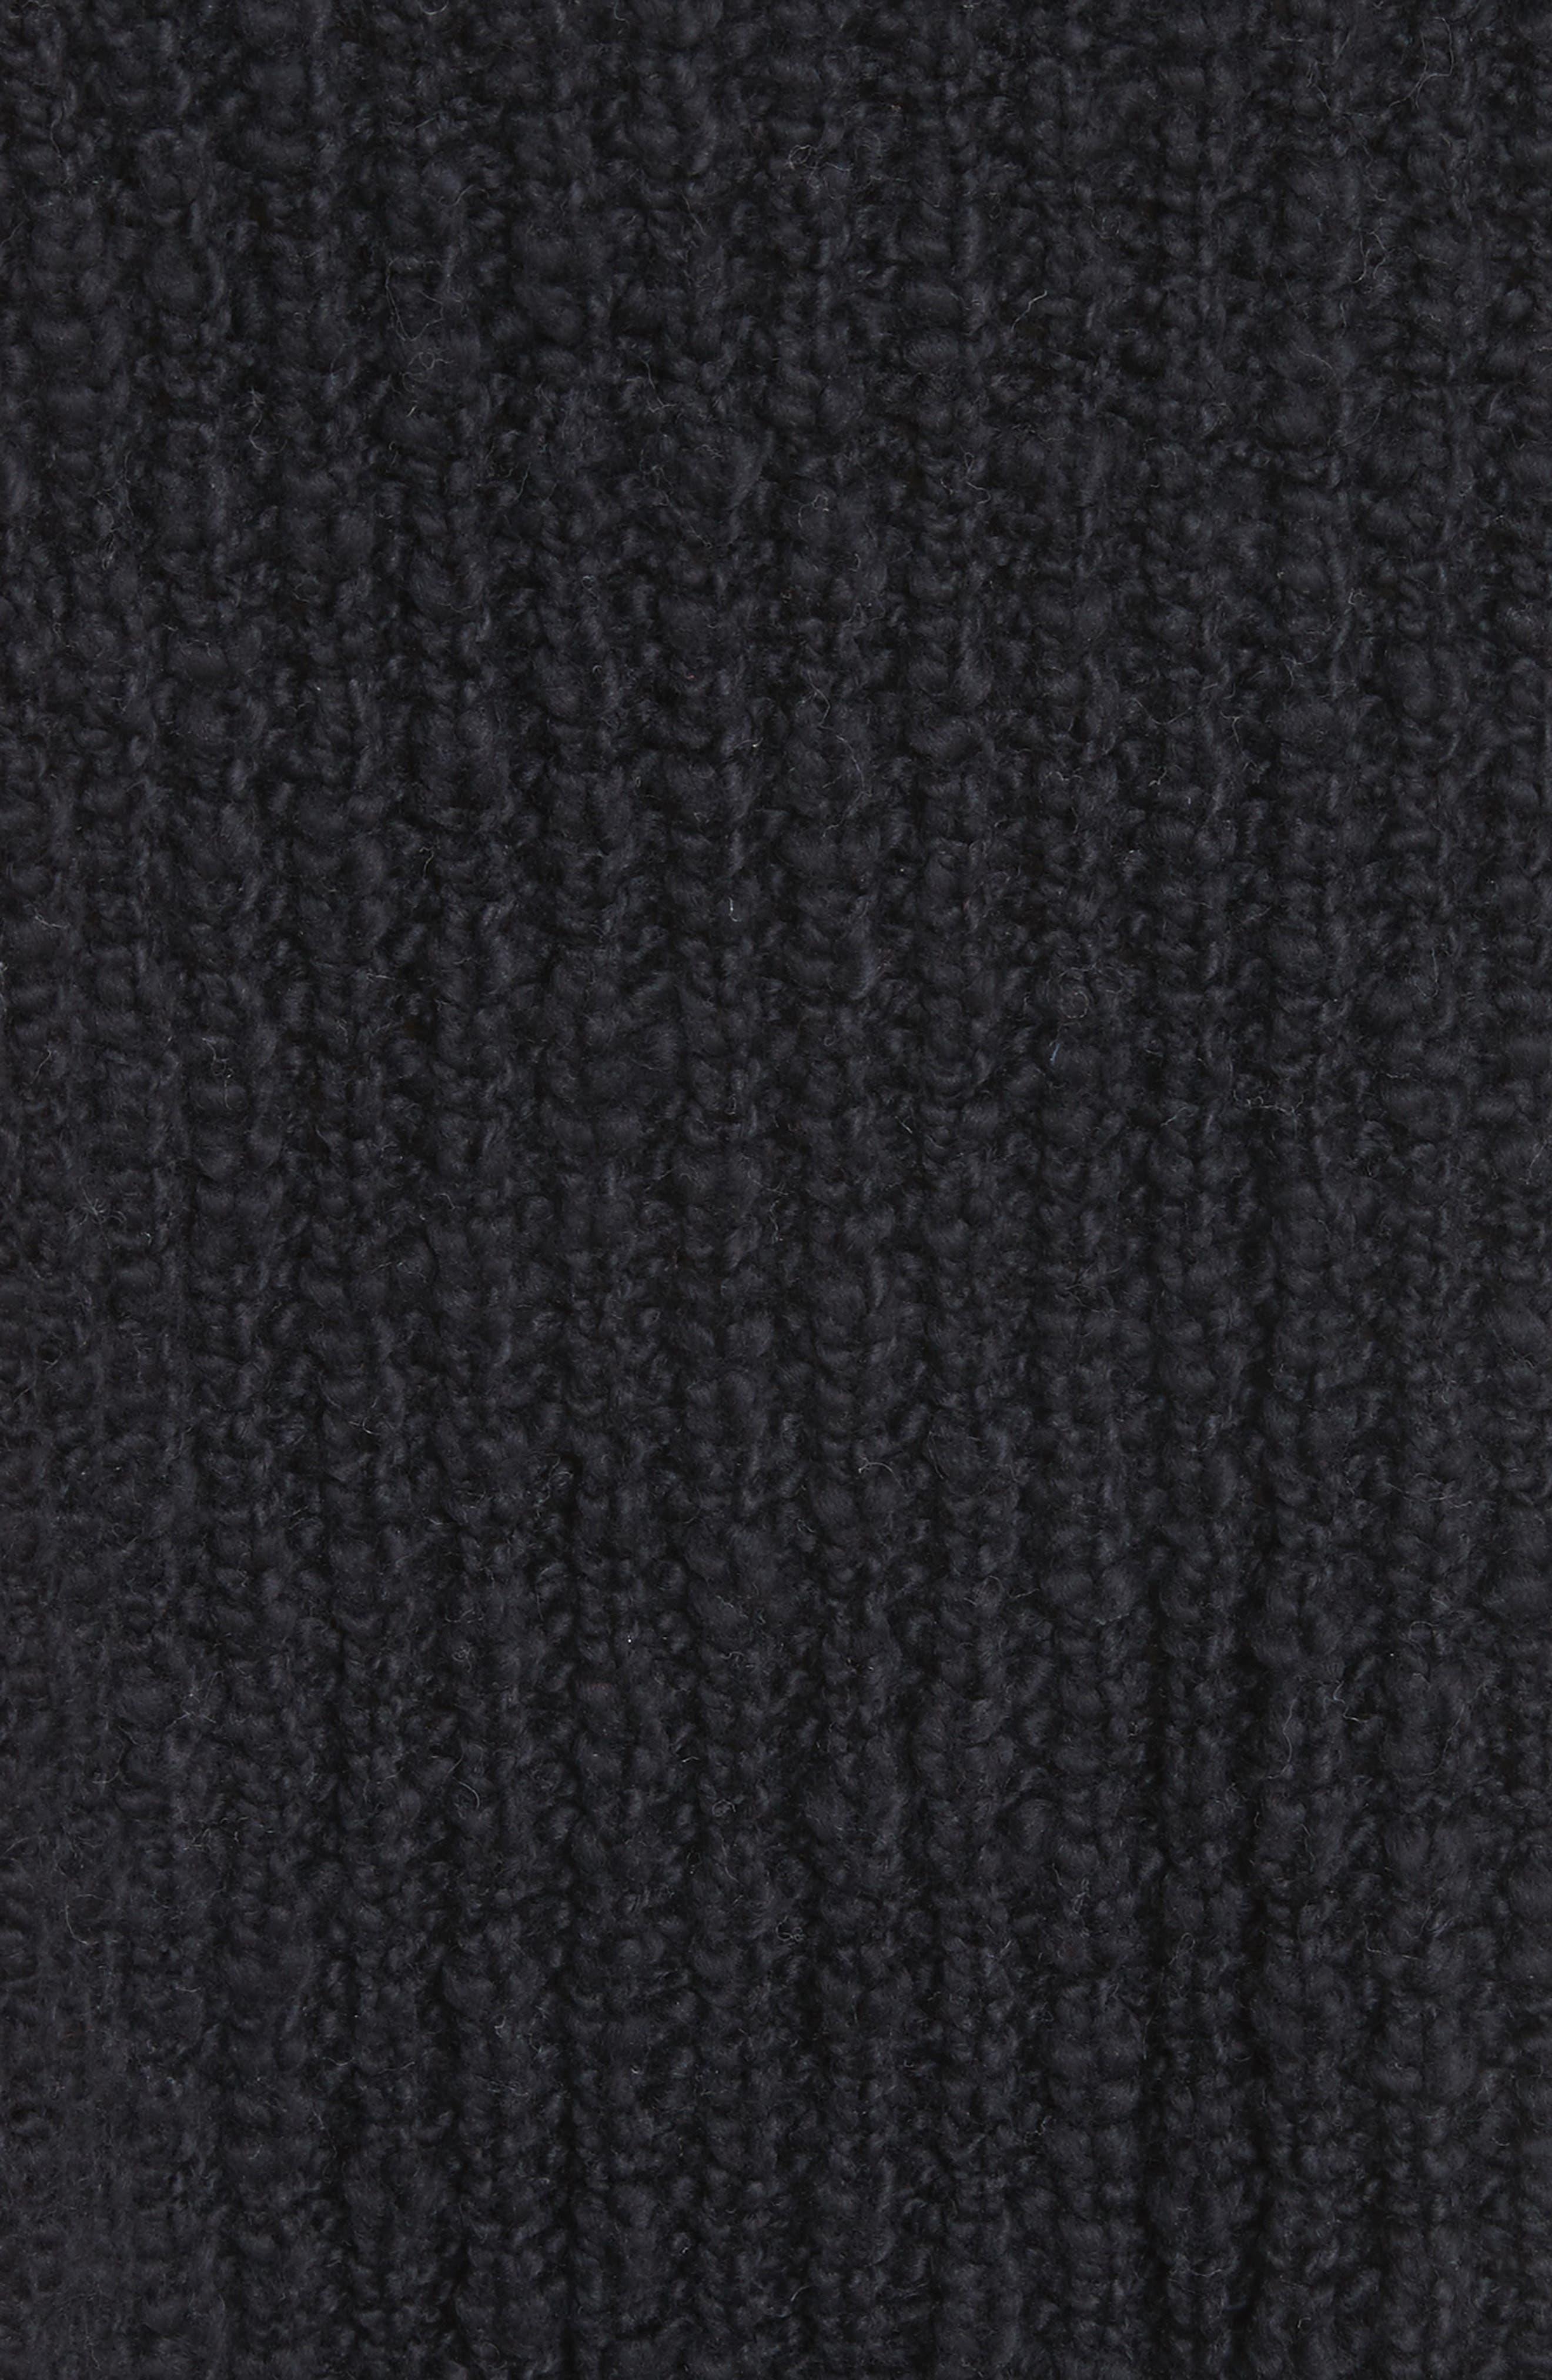 Pandora's Boatneck Sweater,                             Alternate thumbnail 5, color,                             001